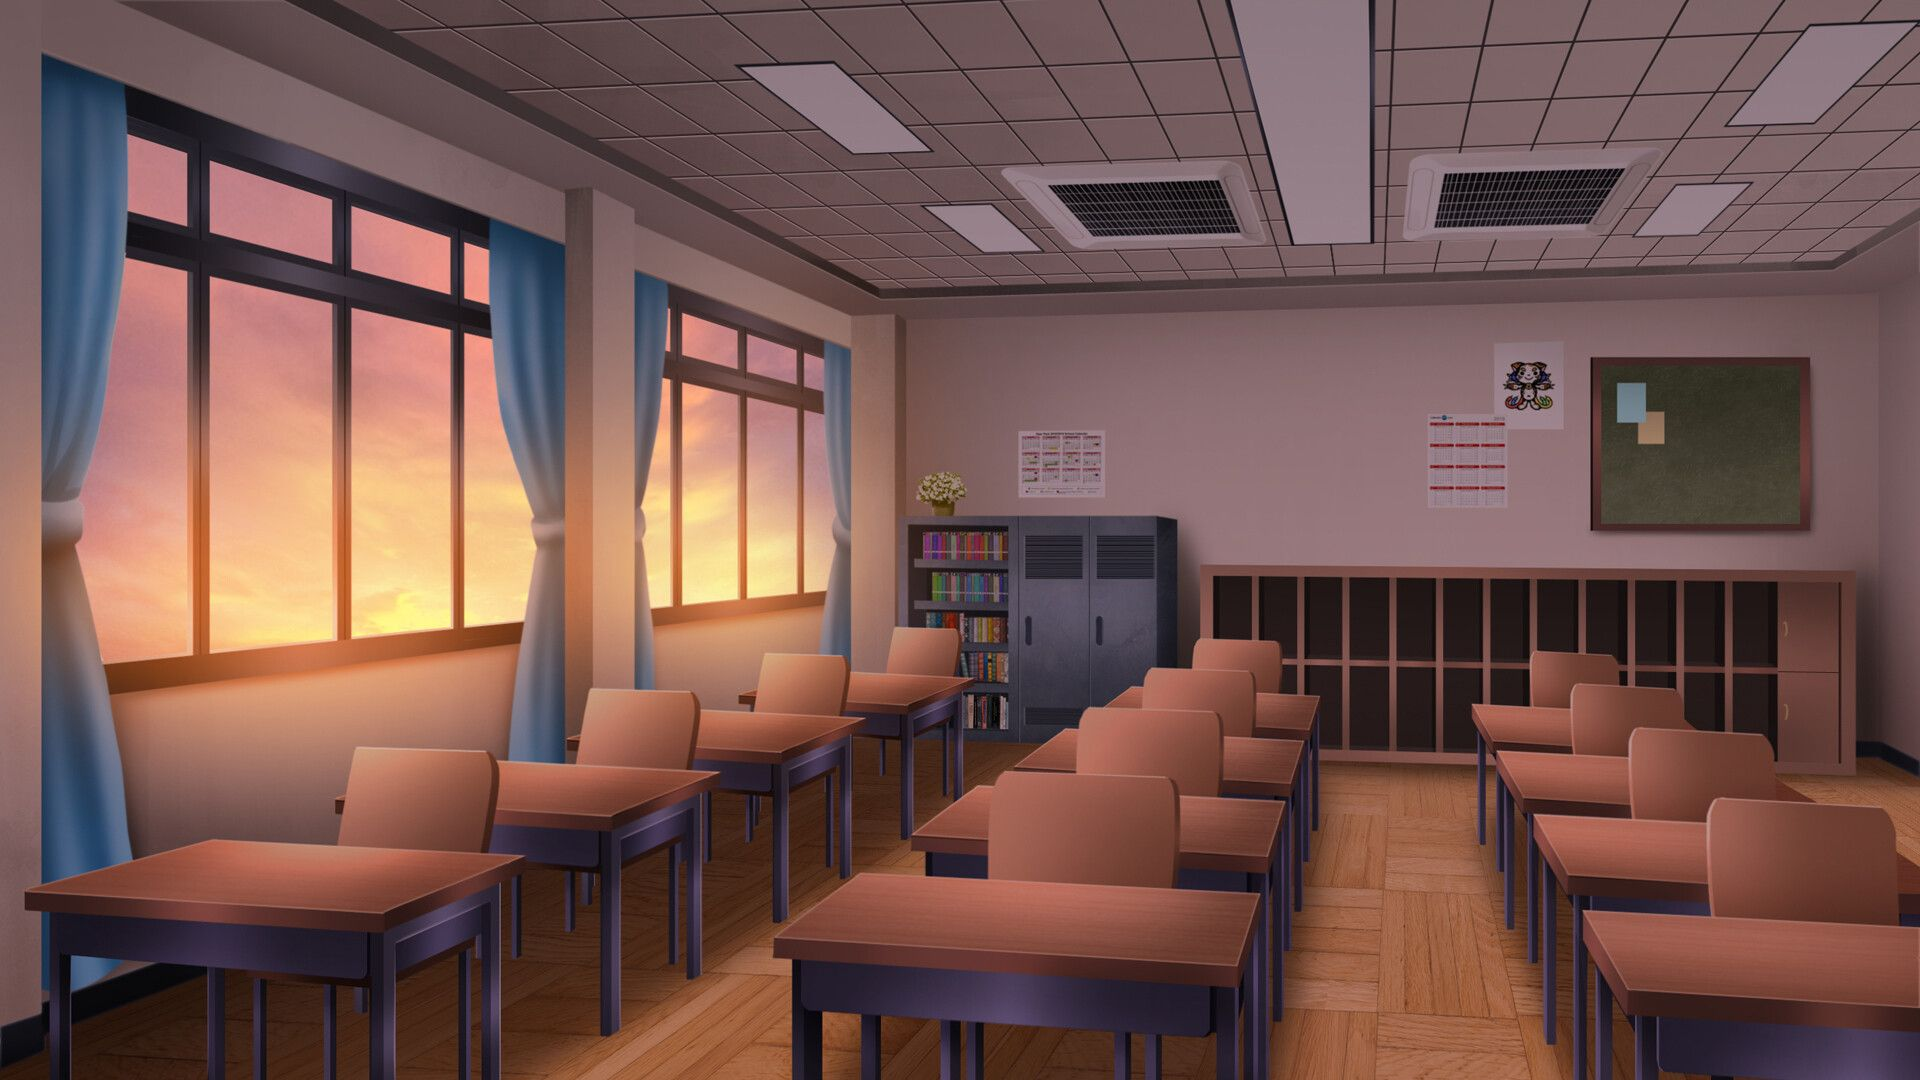 Photo of Classroom (visual novel BG), Duy Tung